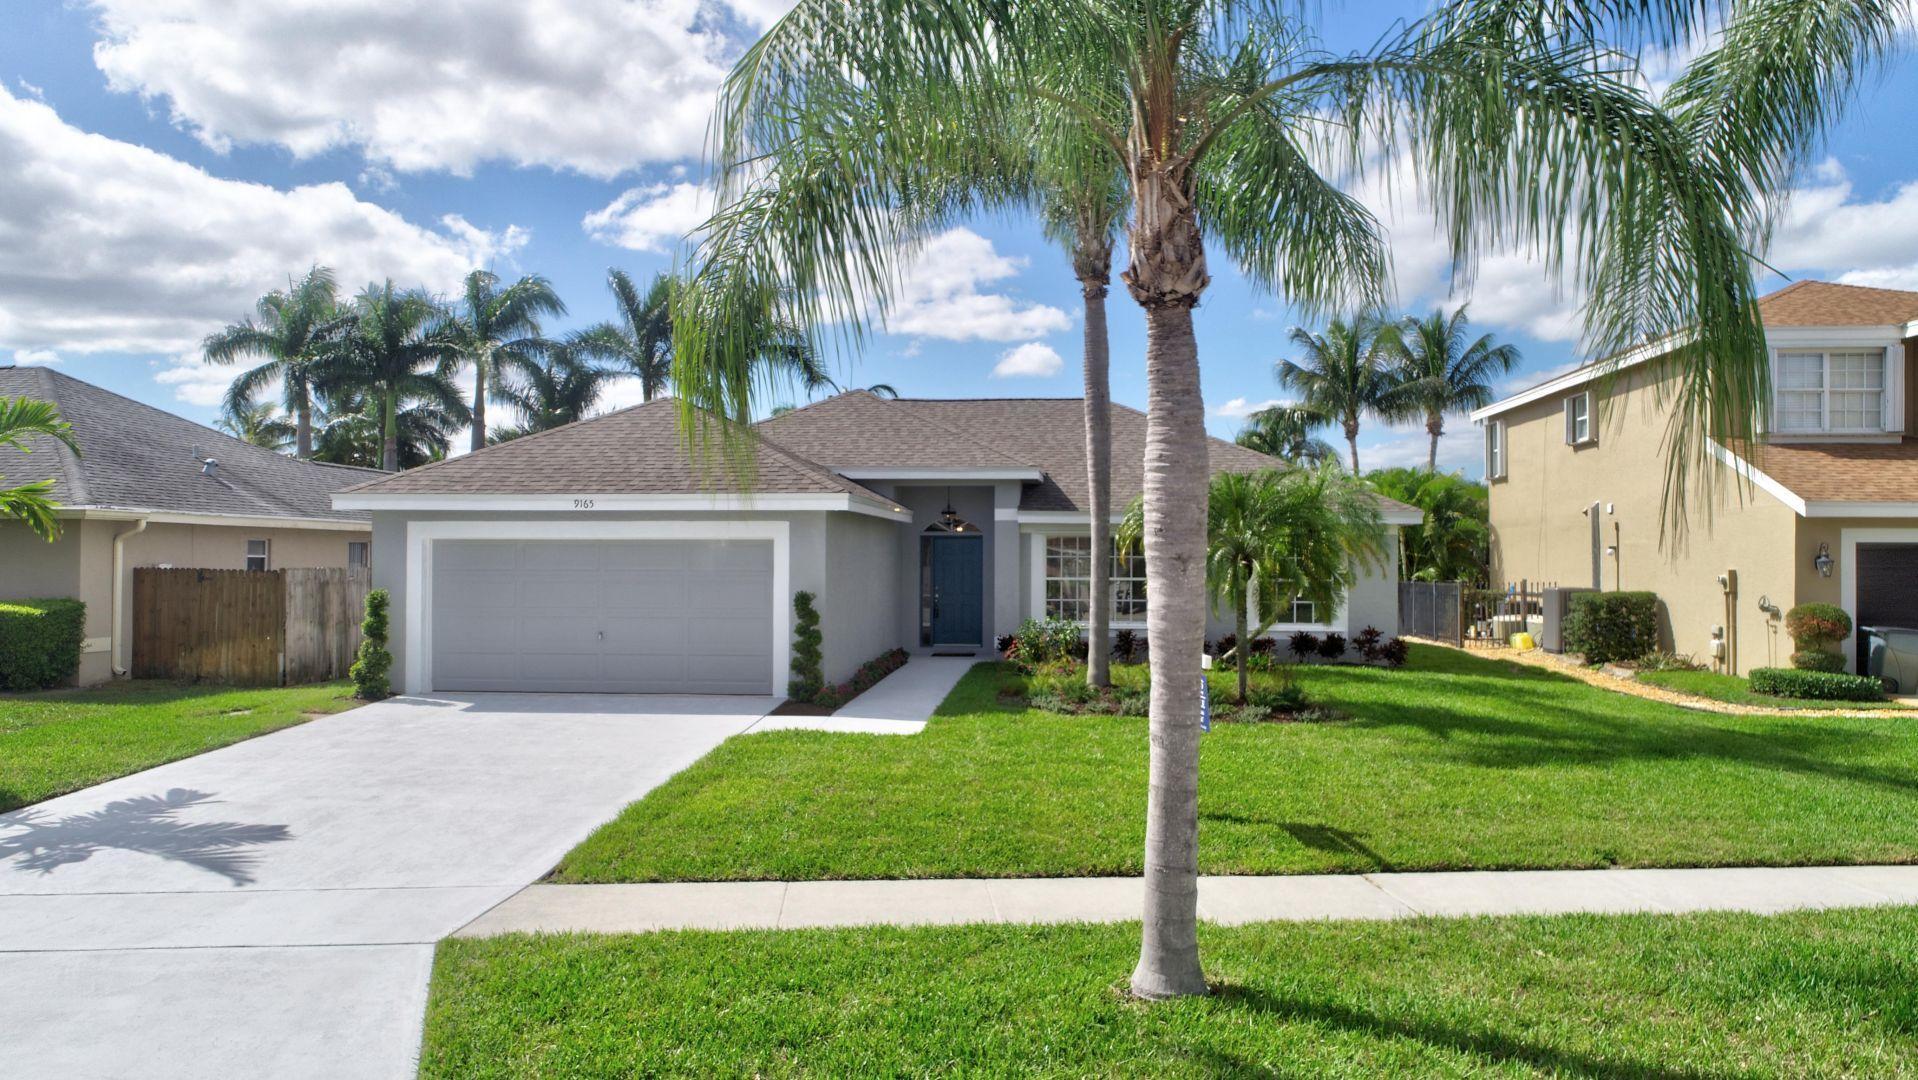 9165 Magenta Drive Boynton Beach, FL 33472